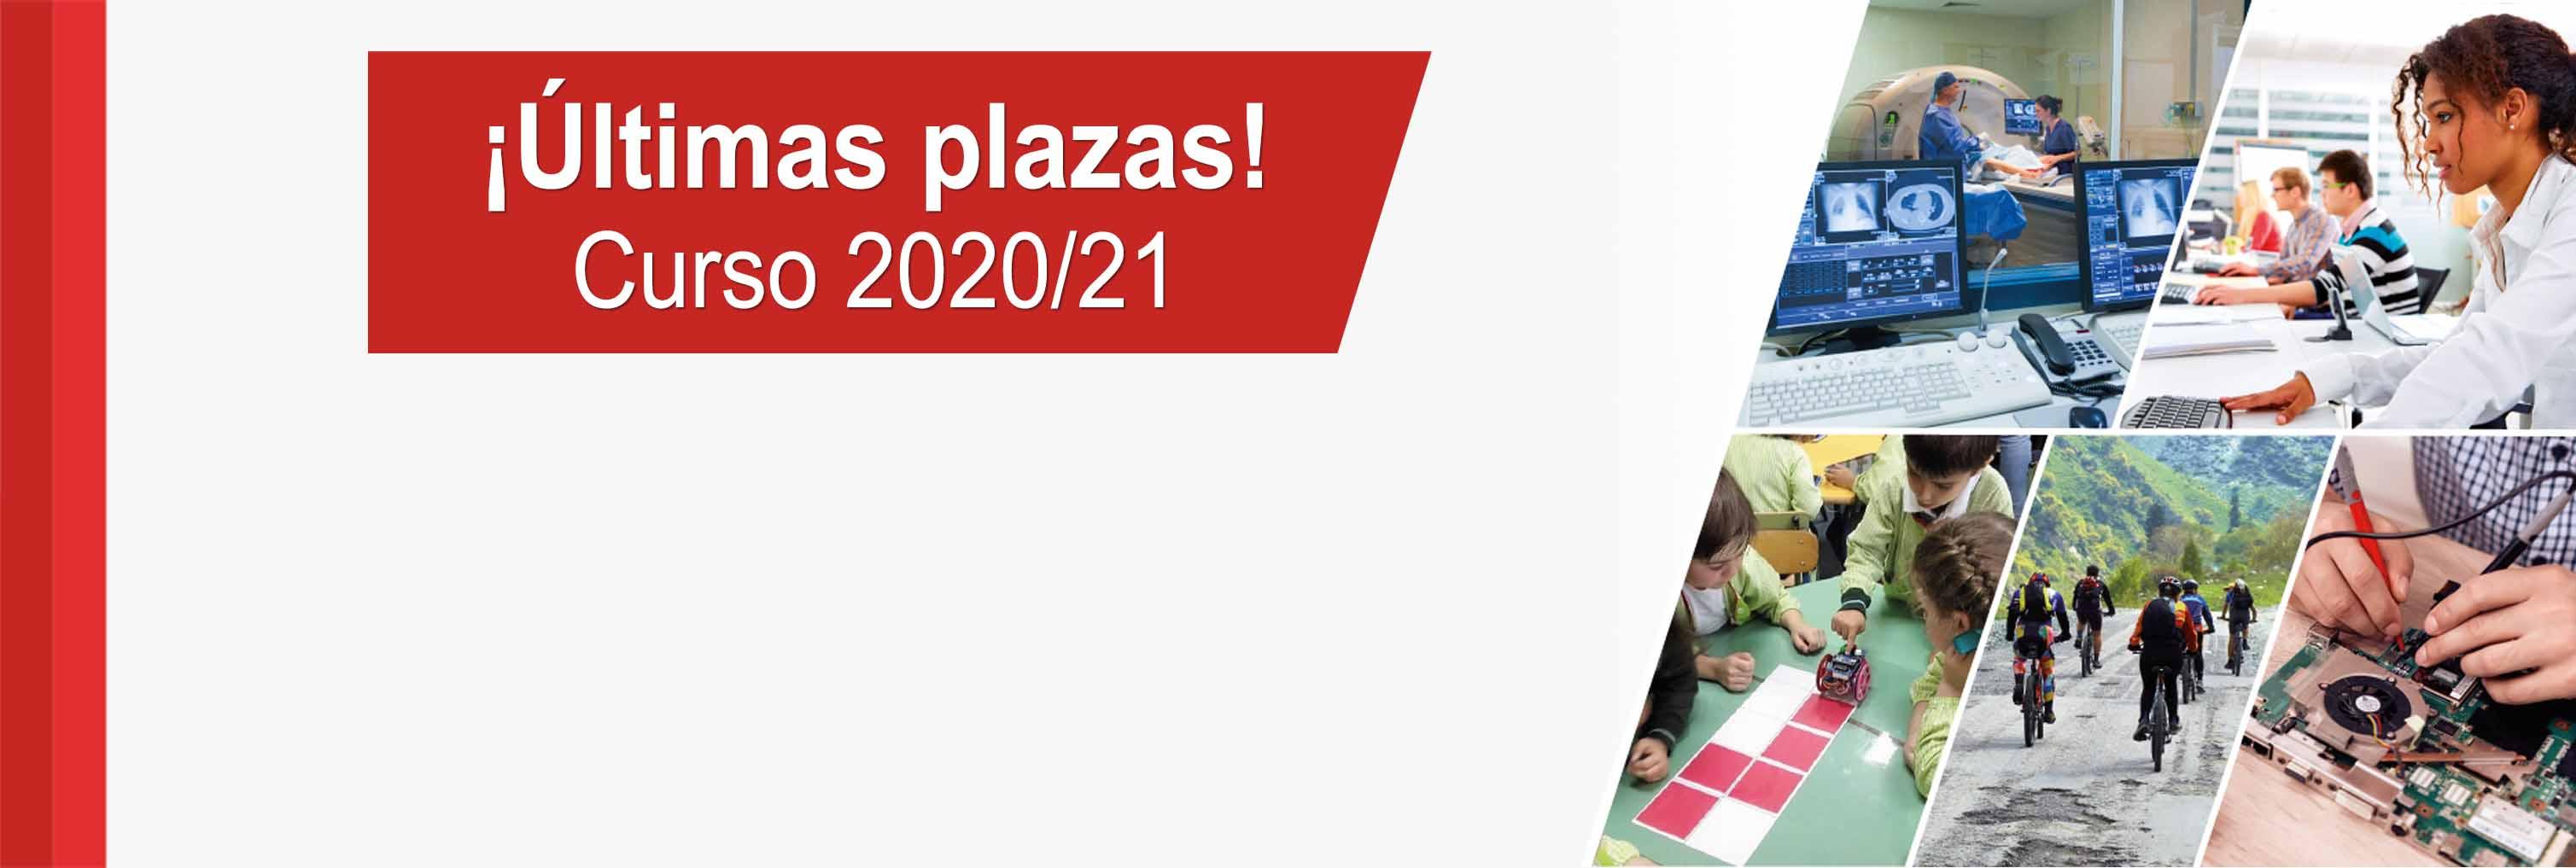 slide-web-fp-ultimas-plazas-2020